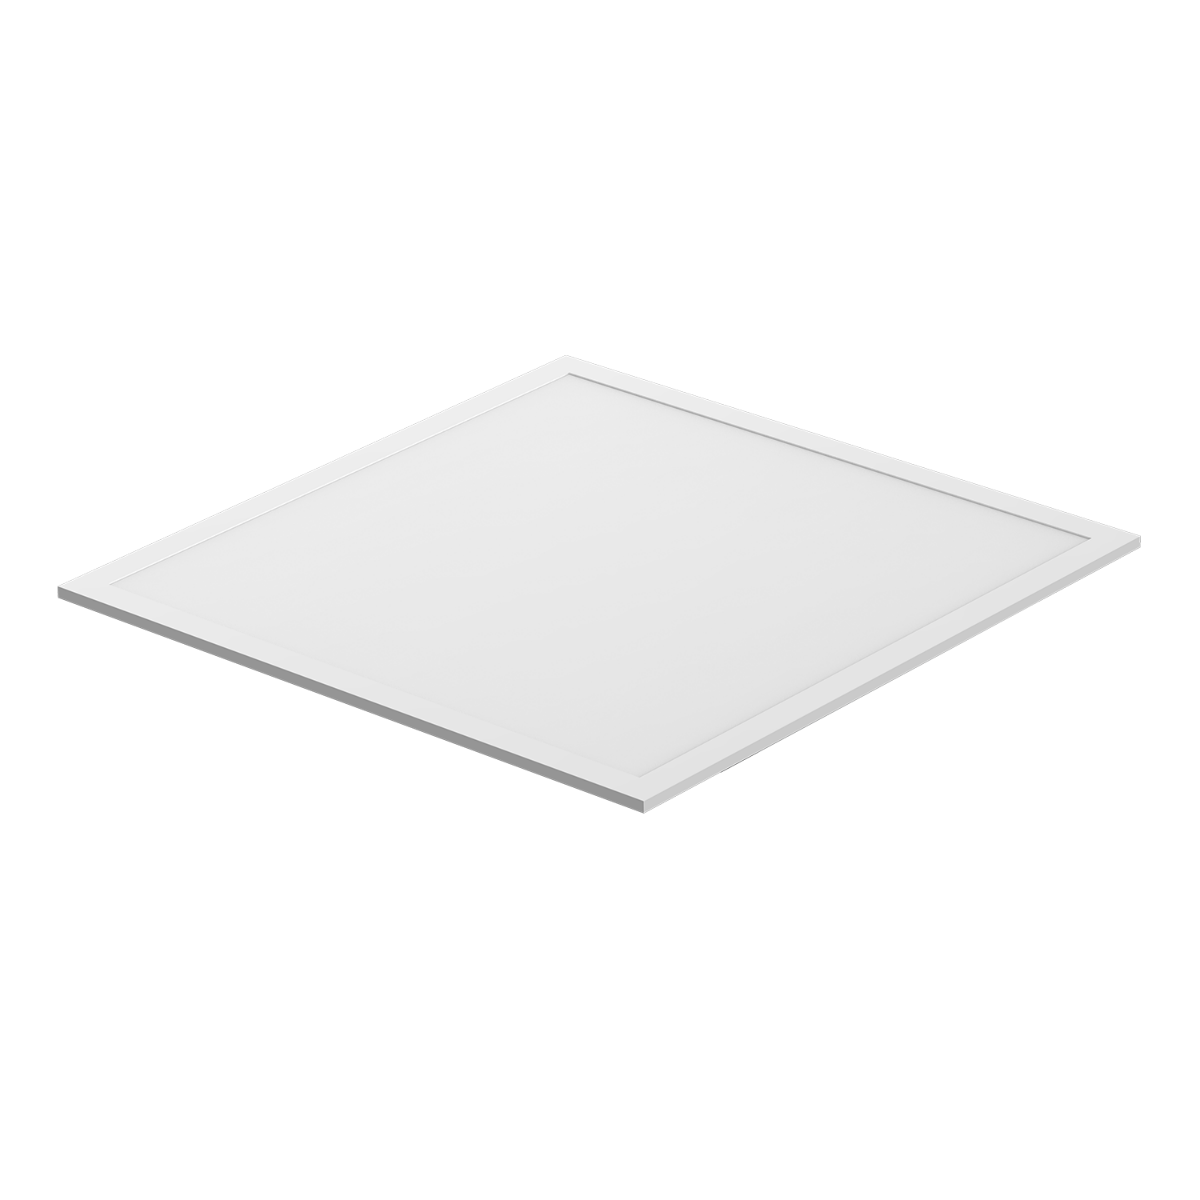 Noxion LED Panel Econox 32W 60x60cm 3000K 3900lm UGR <22 | Warm White - Replaces 4x18W